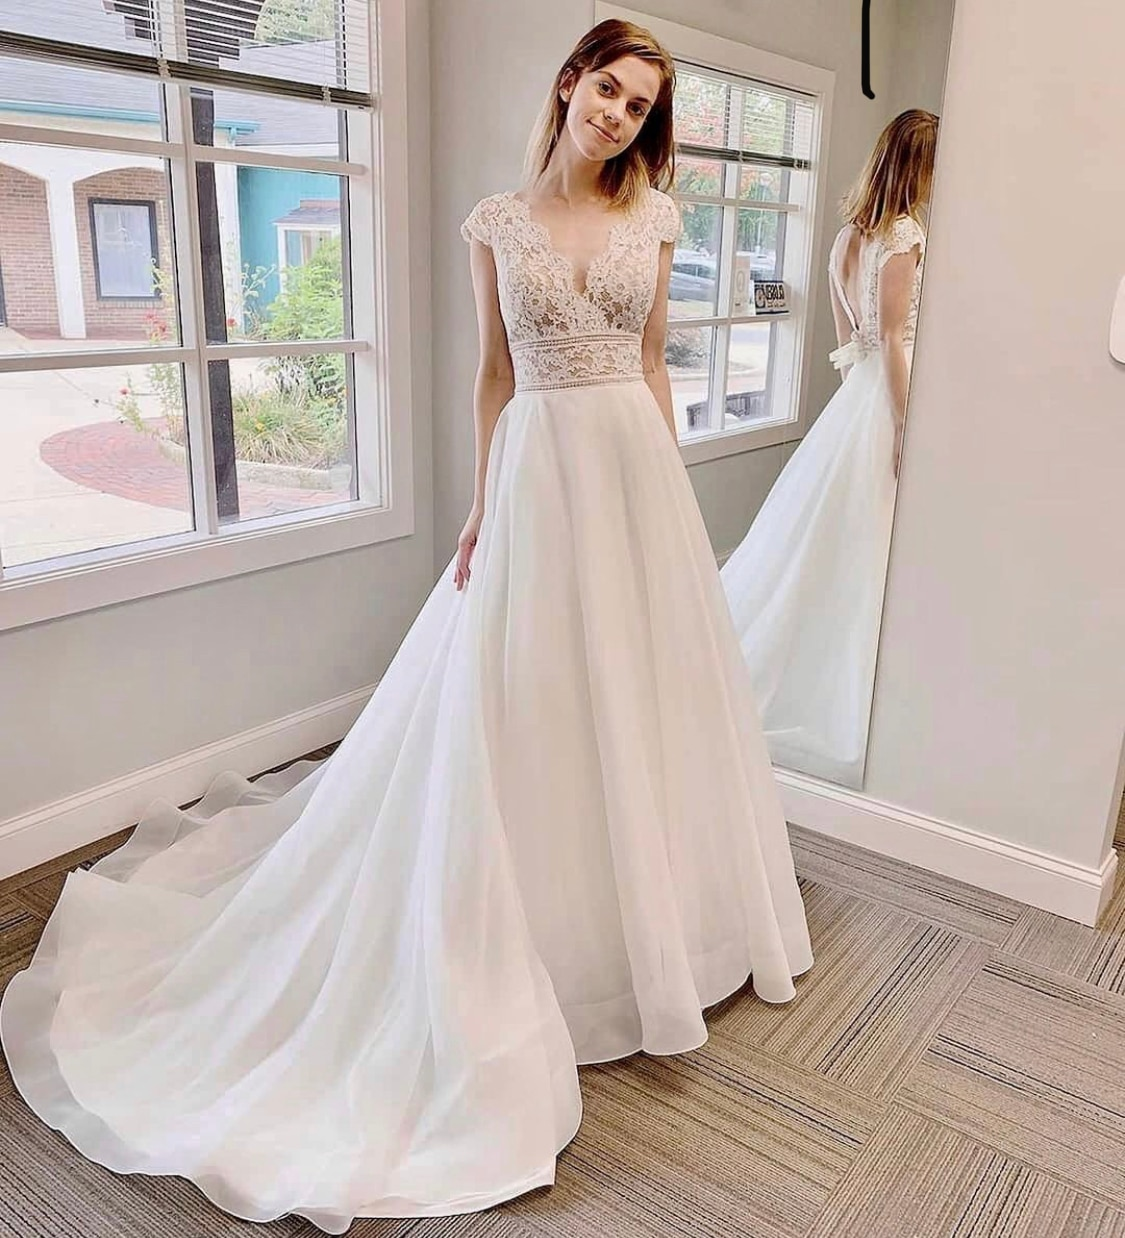 Hochzeit Kleid A-Line V-ausschnitt Cap Sleeve Spitze Appliques Backless Bodenlangen Sweep Zug Wunderschöne Brautkleid Nach Maß Neue